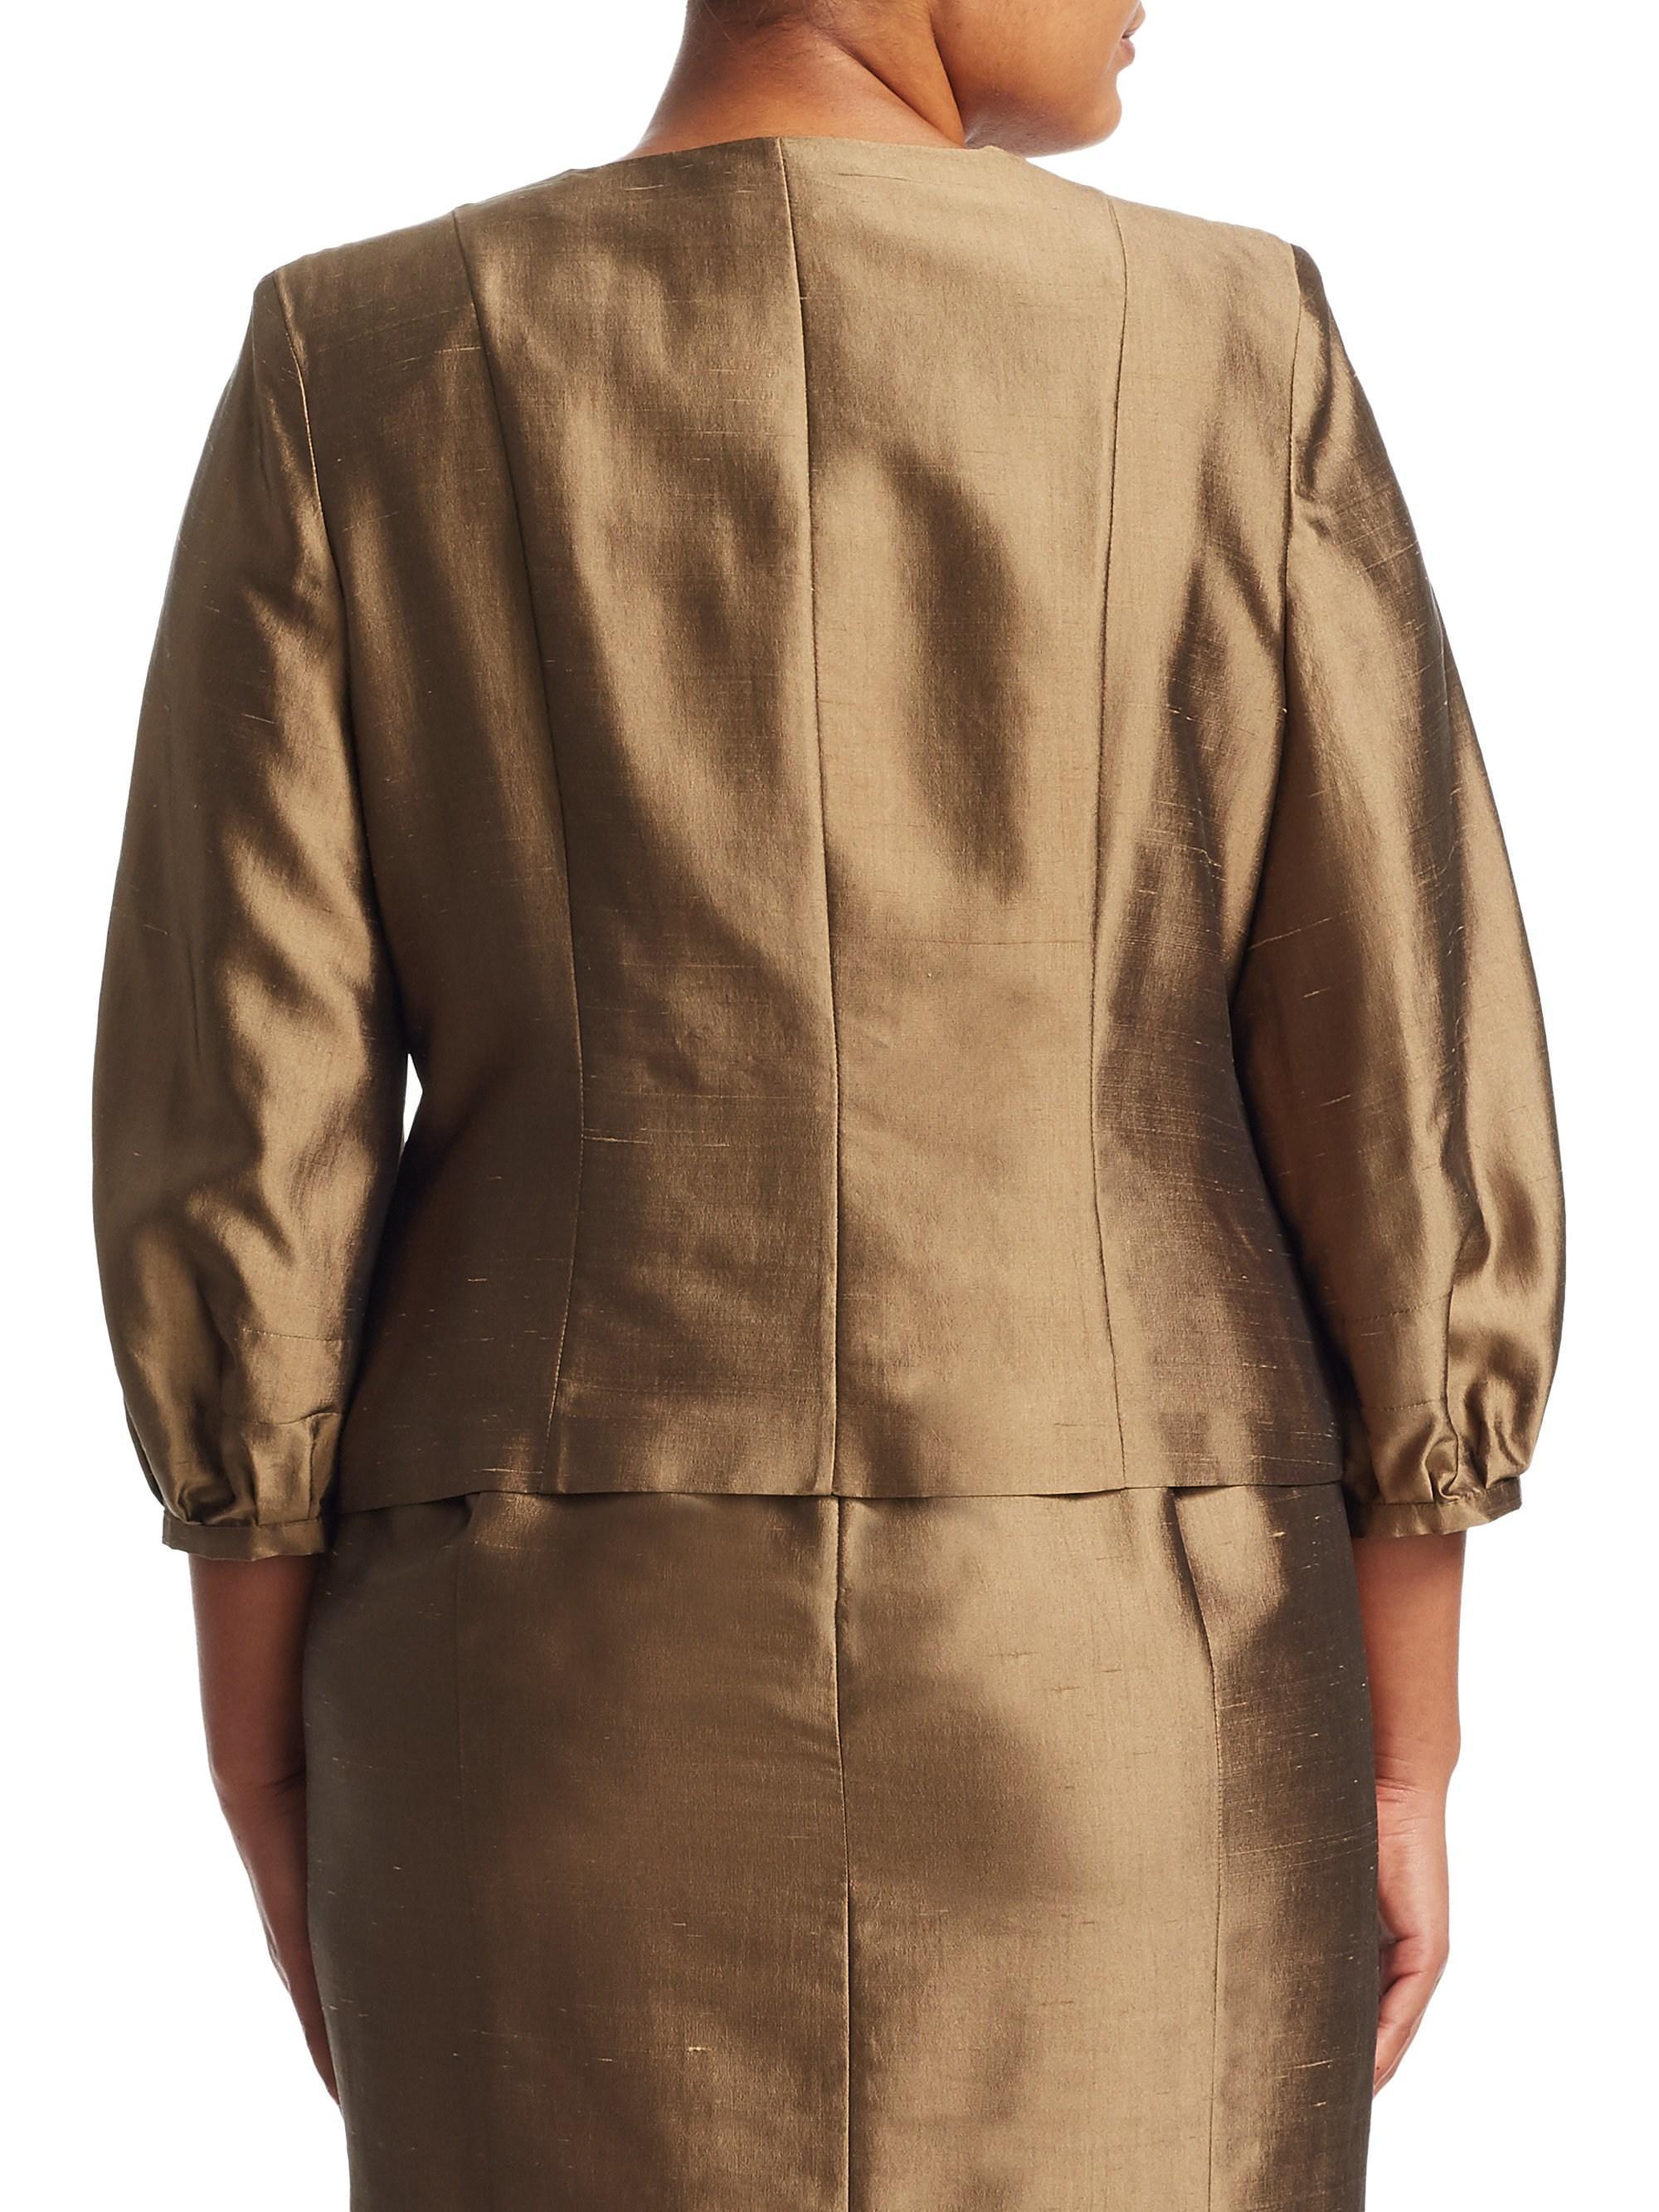 b729ddaf07c Marina Rinaldi Certezza Silk Jacket in Brown - Lyst